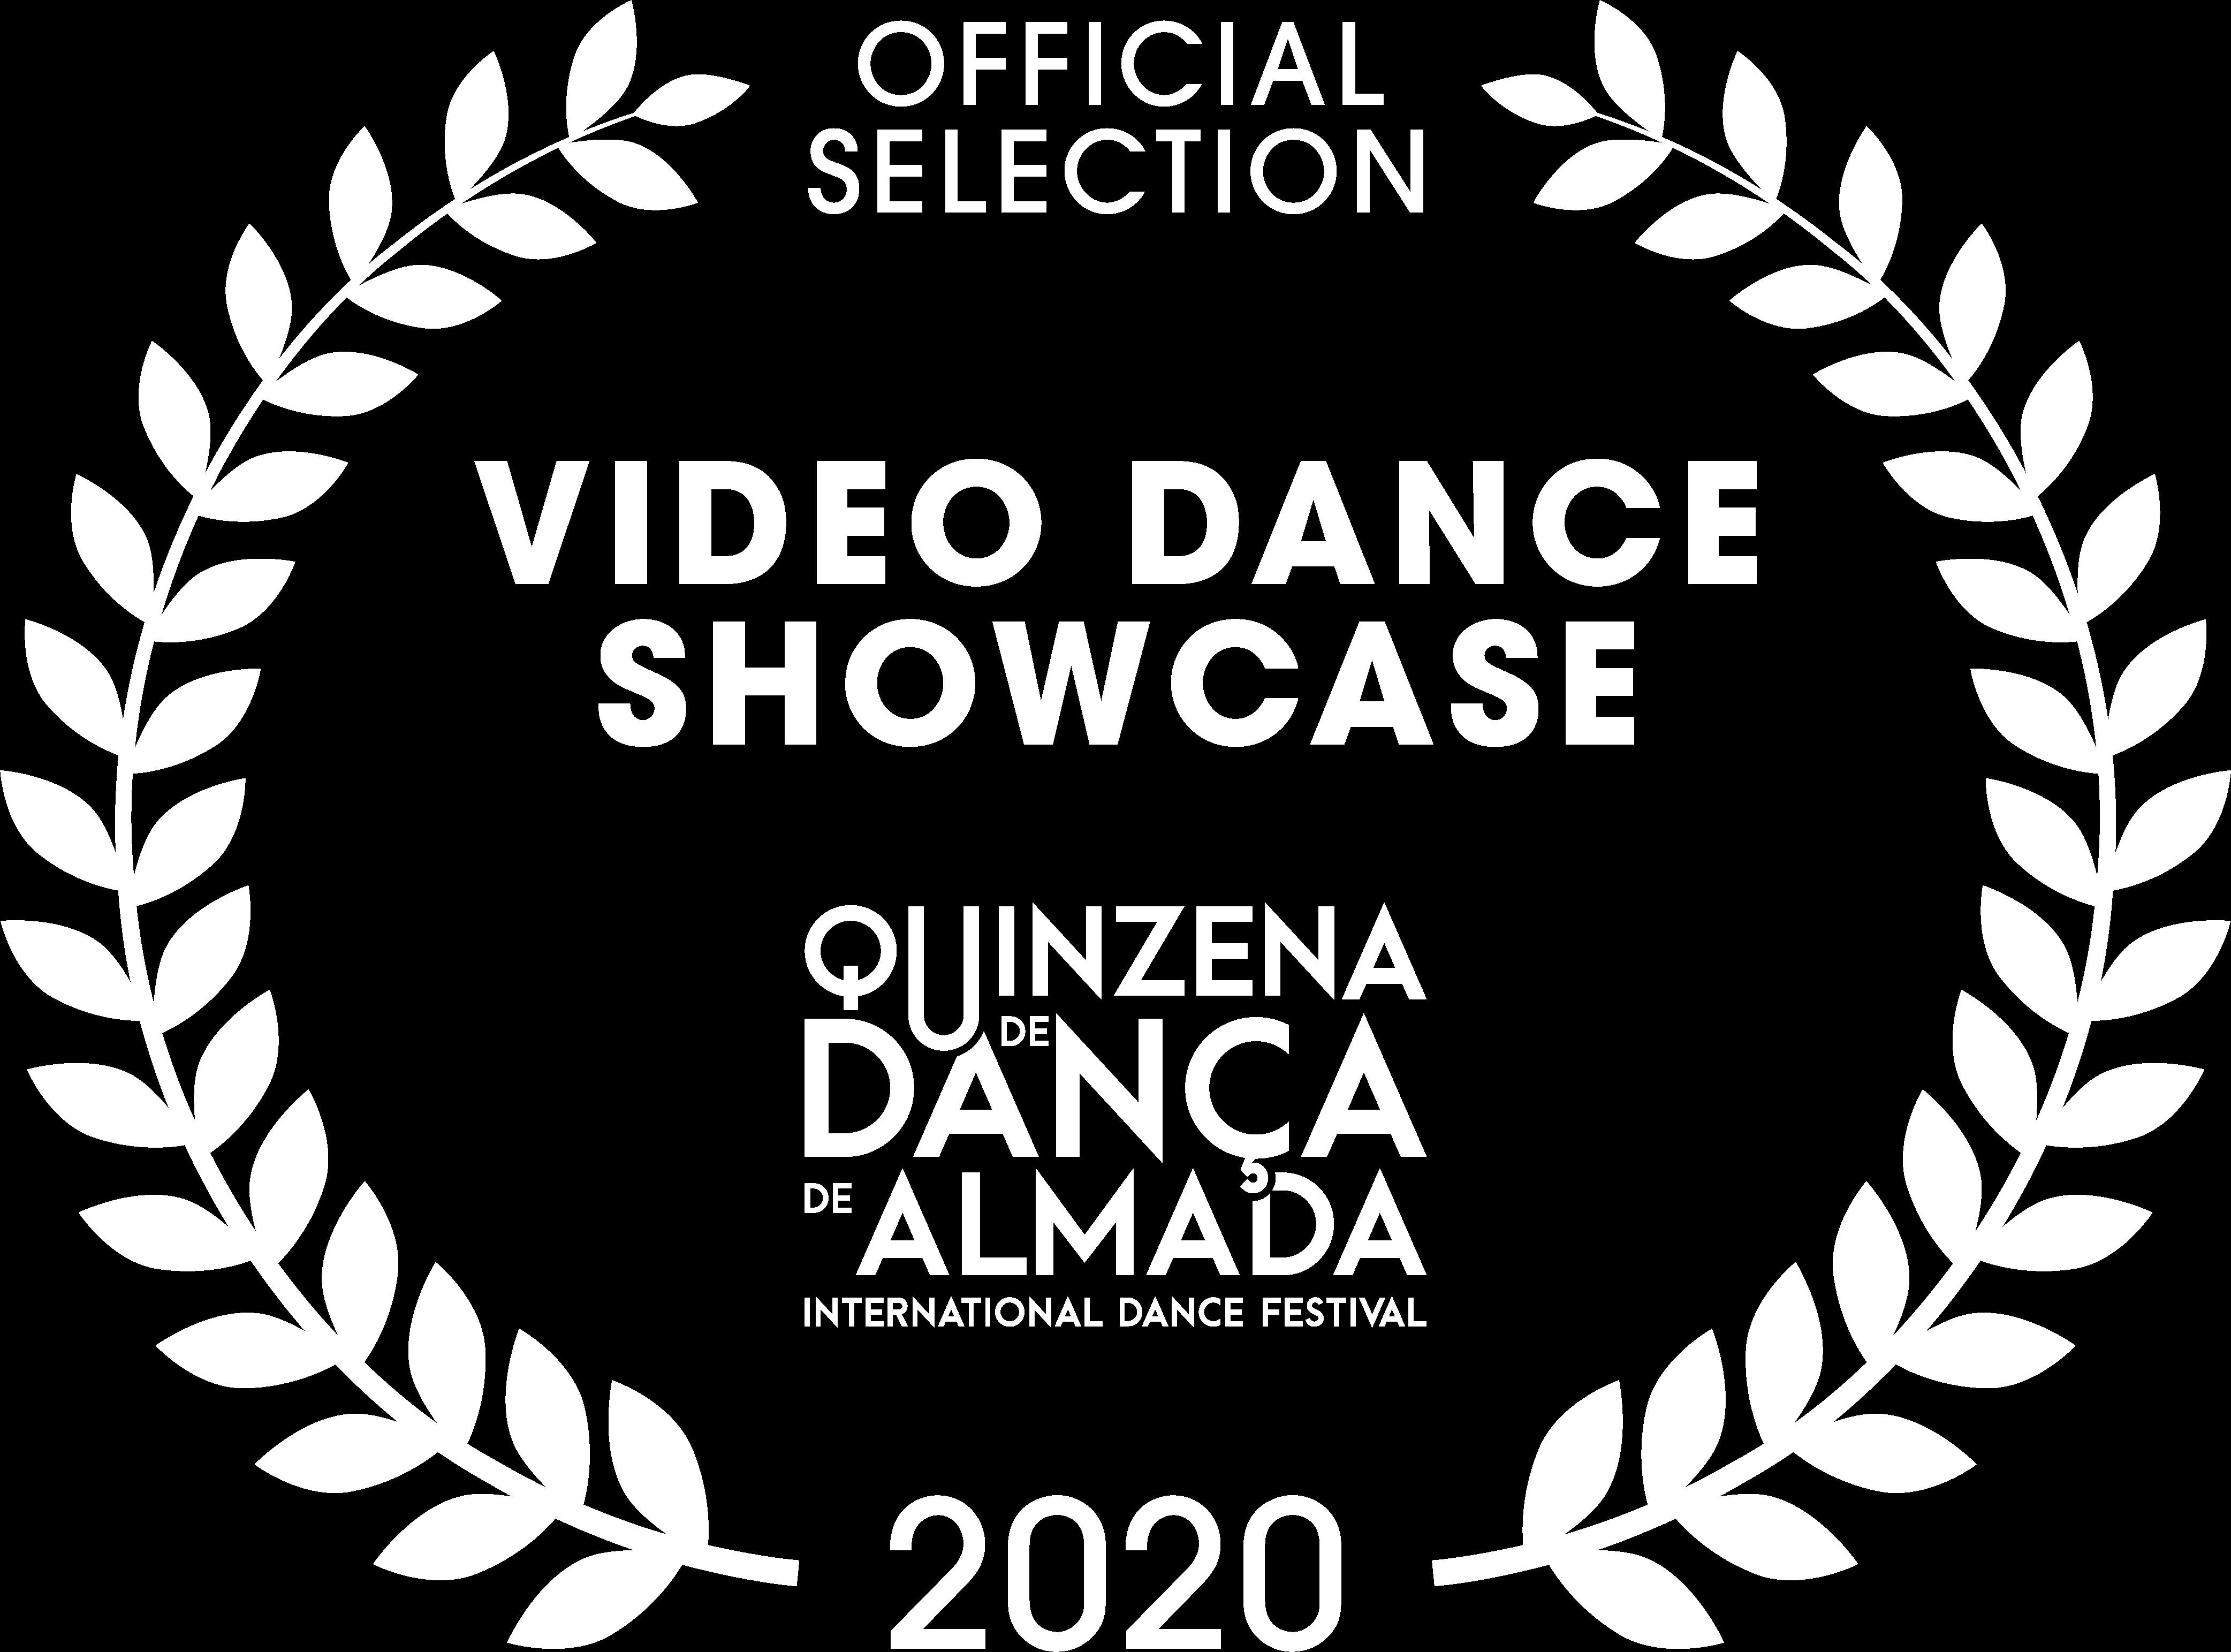 VIDEO DANCE SHOWCASE_Official Selection